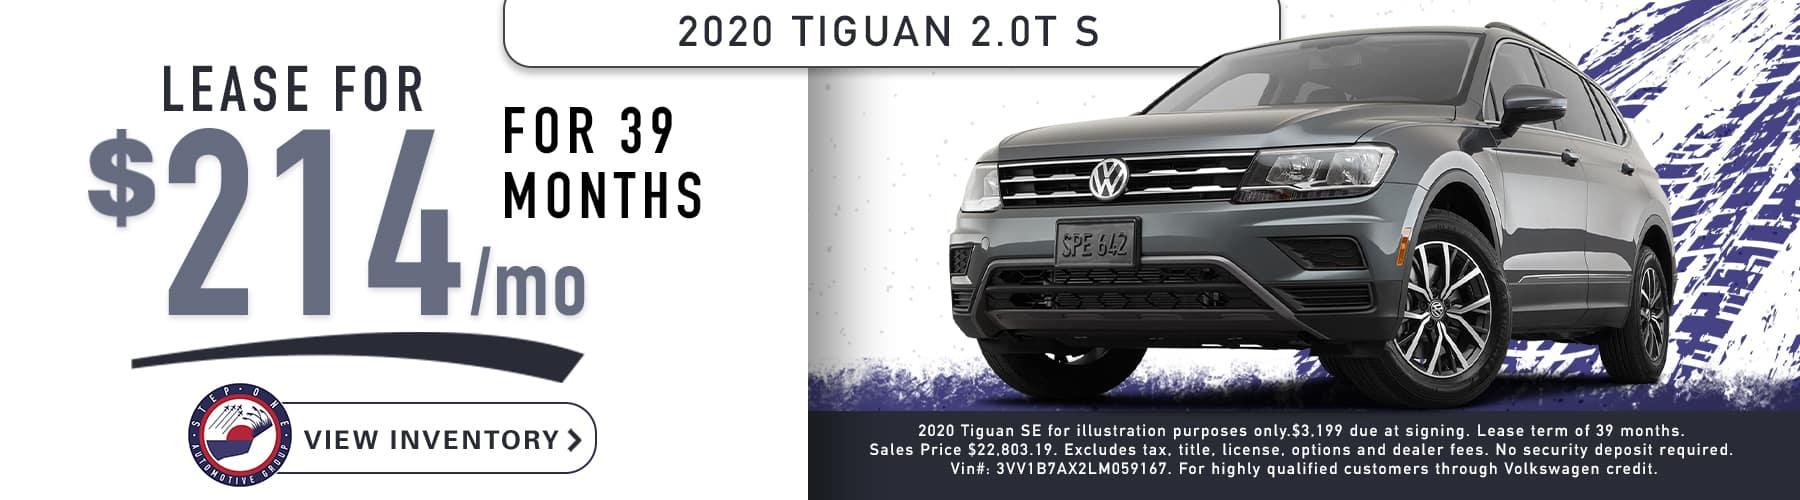 VW Fort Walton Beach February 2020 2020 Tiguan 1800x500